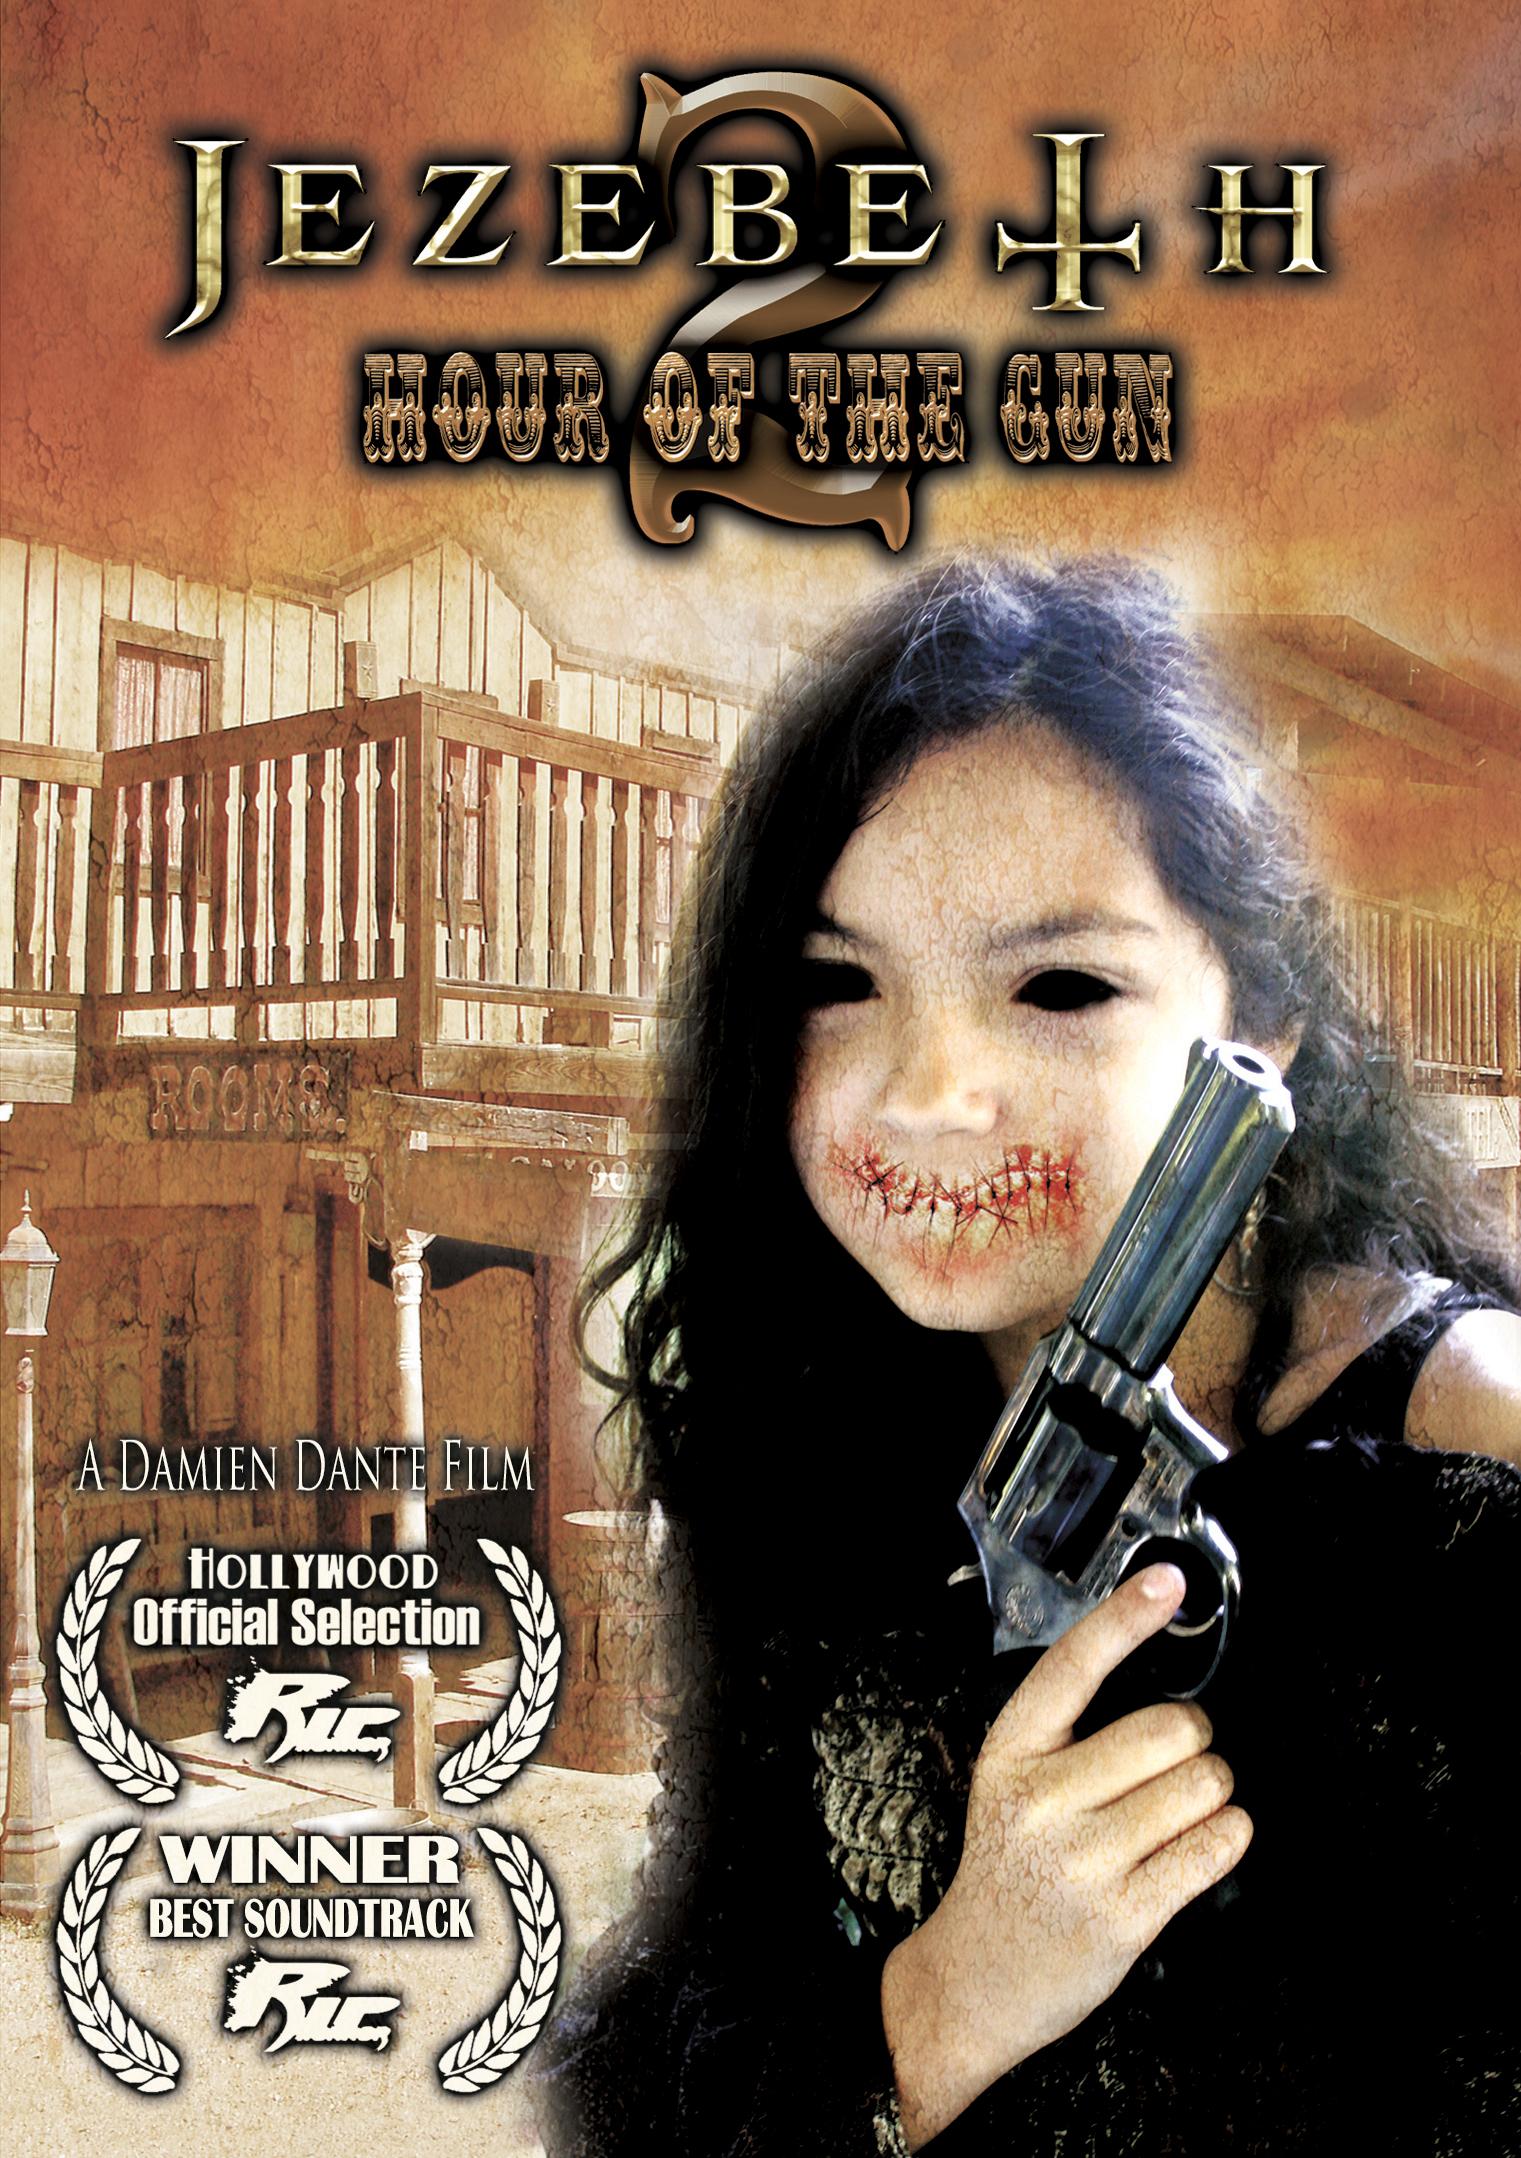 Jezebeth 2: Hour of the Gun